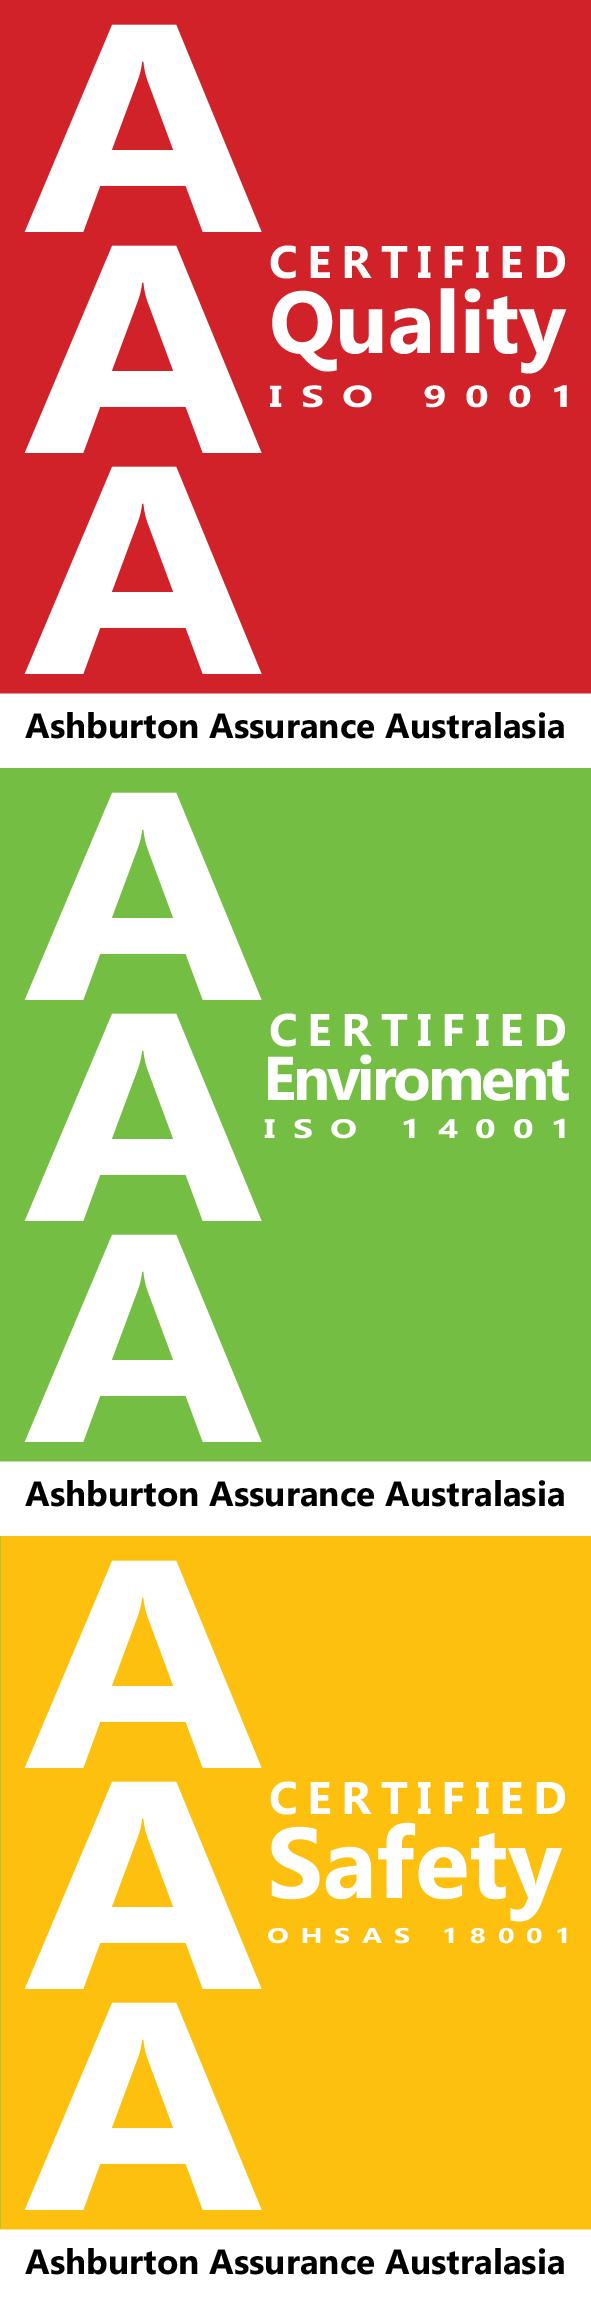 Why Choose Ashburton For Certification Australian Quality